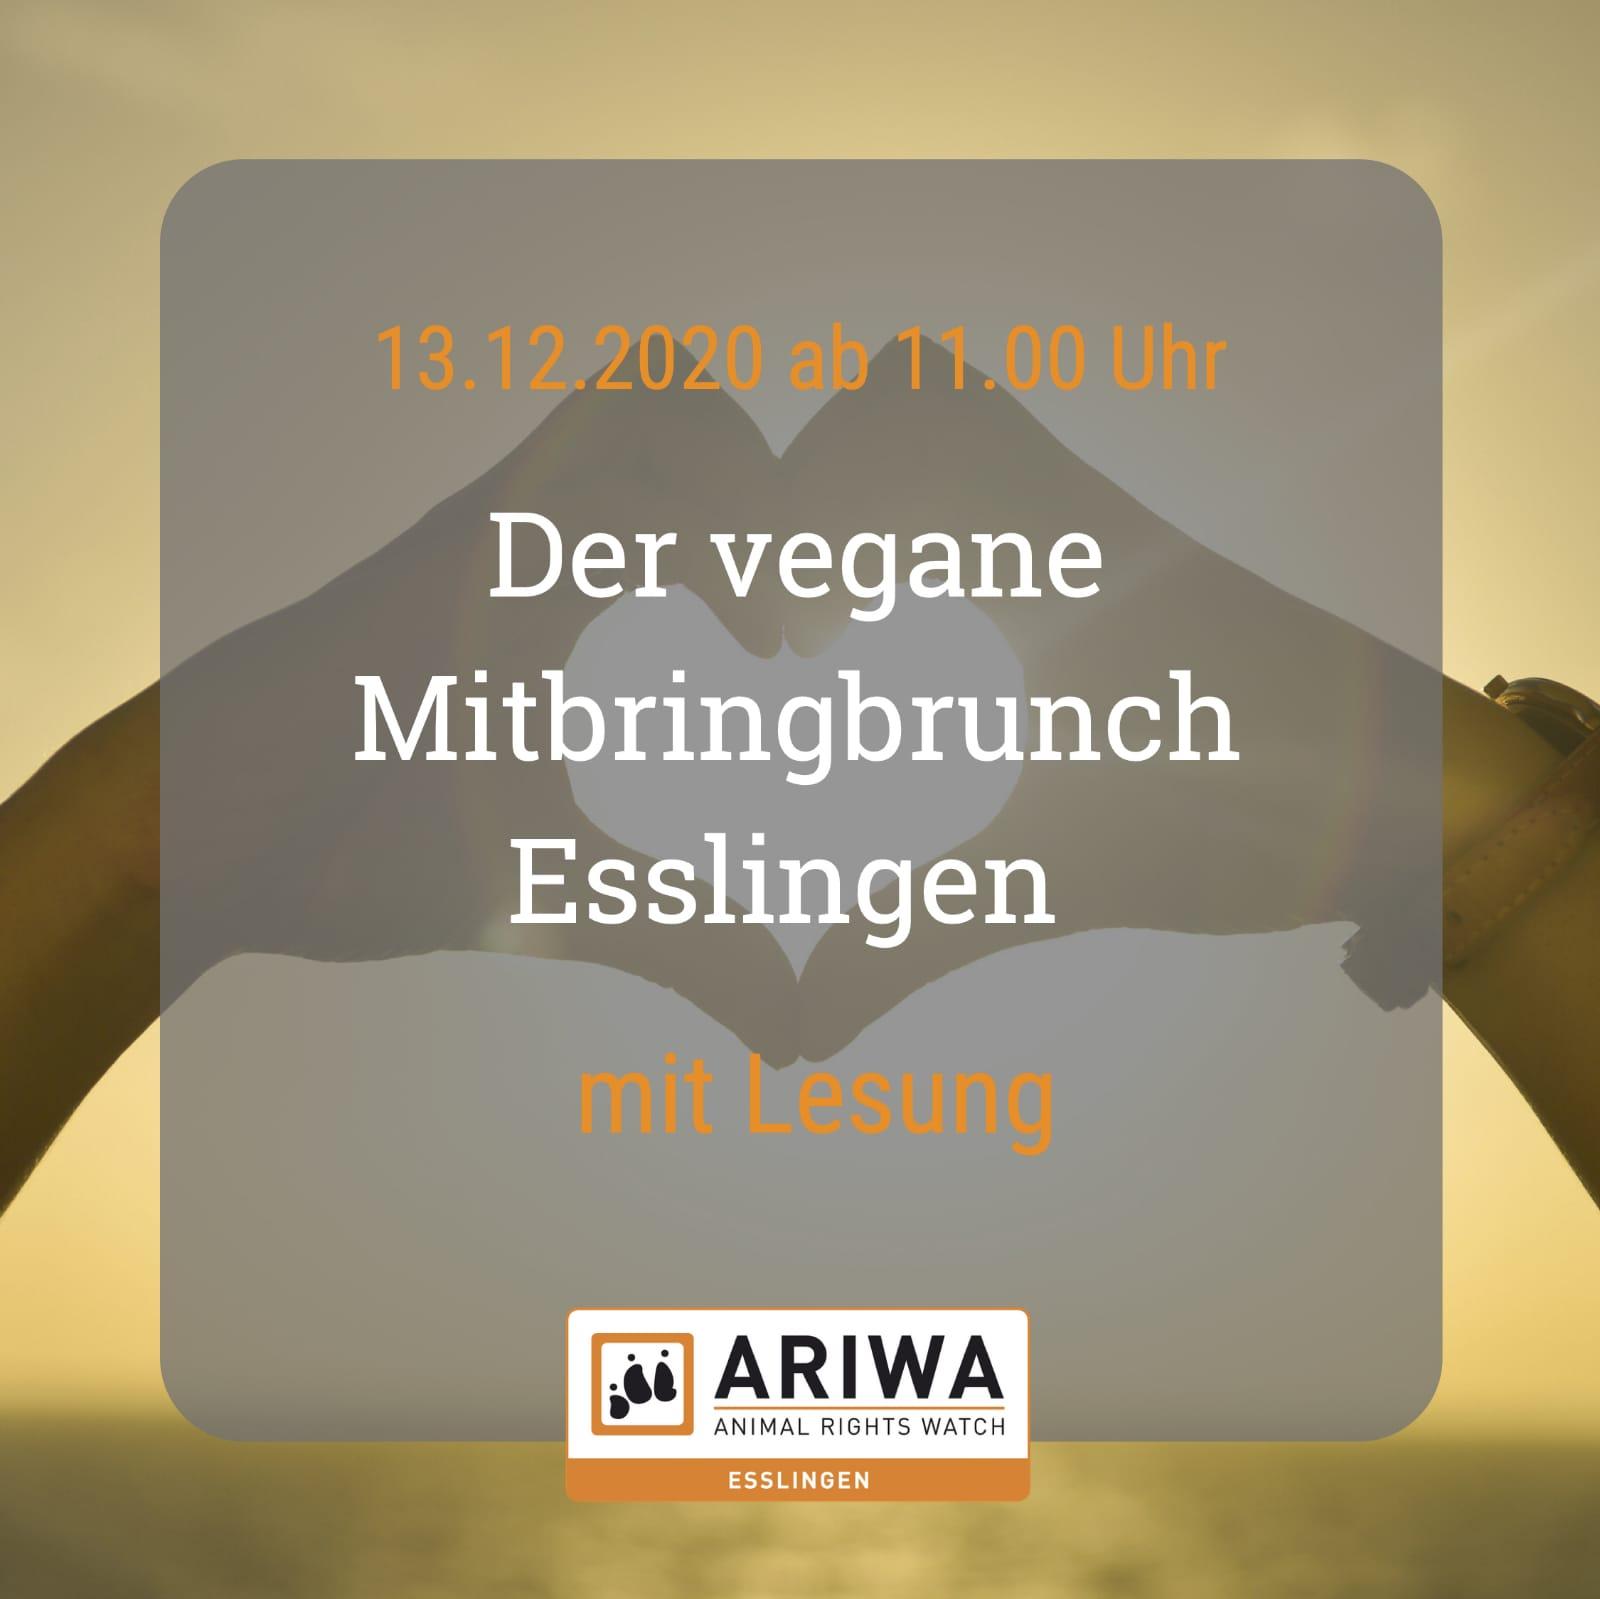 Vegan-Brunch mit Lesung